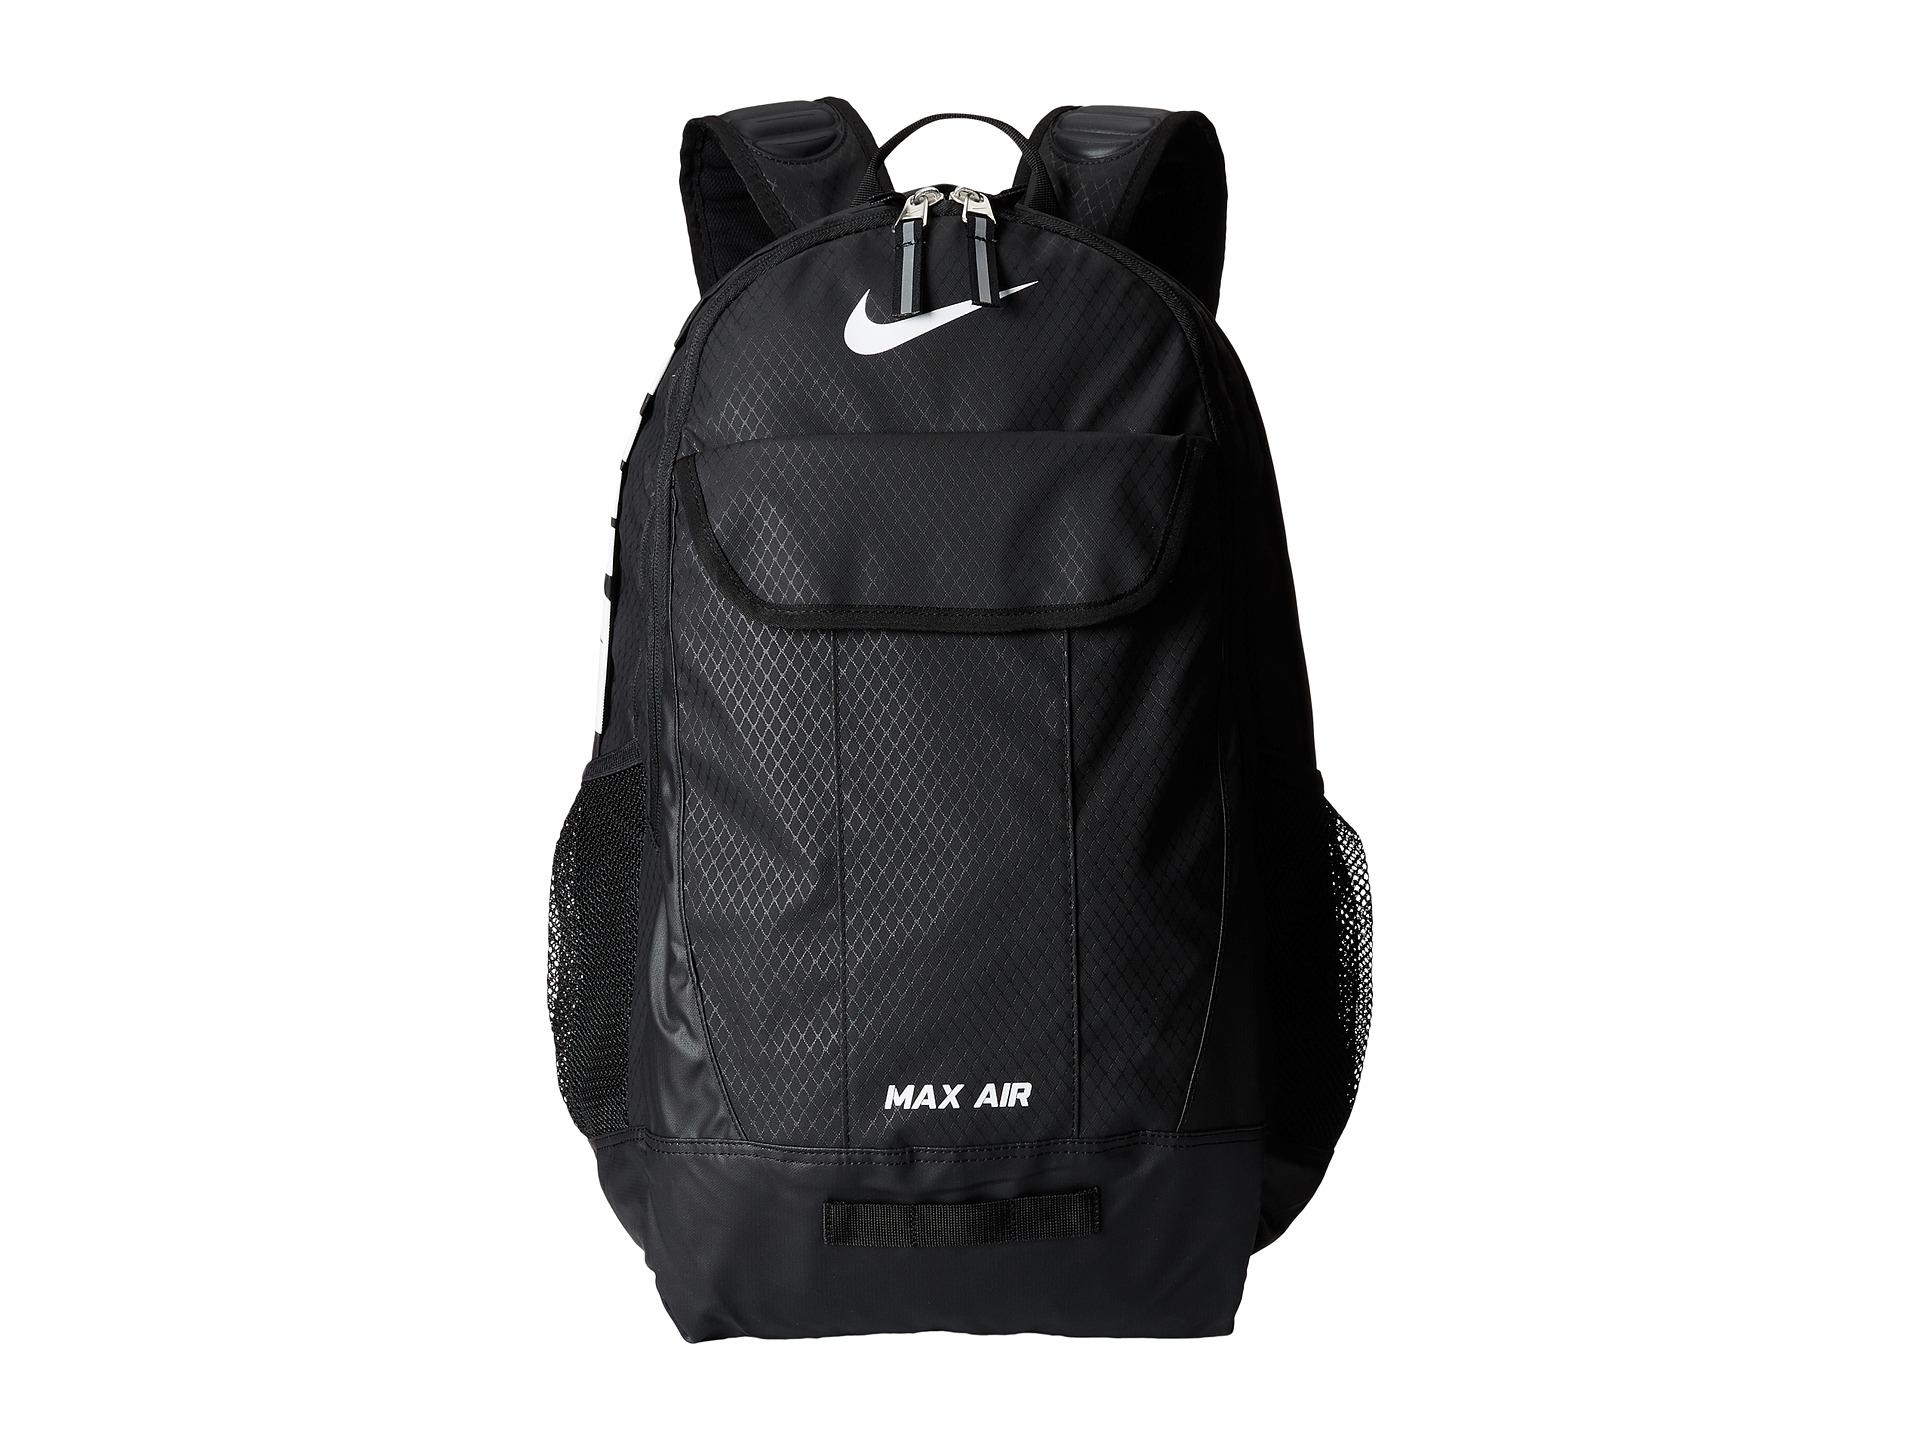 a5460d446b21 Lyst - Nike Team Training Max Air Xl Backpack in Black